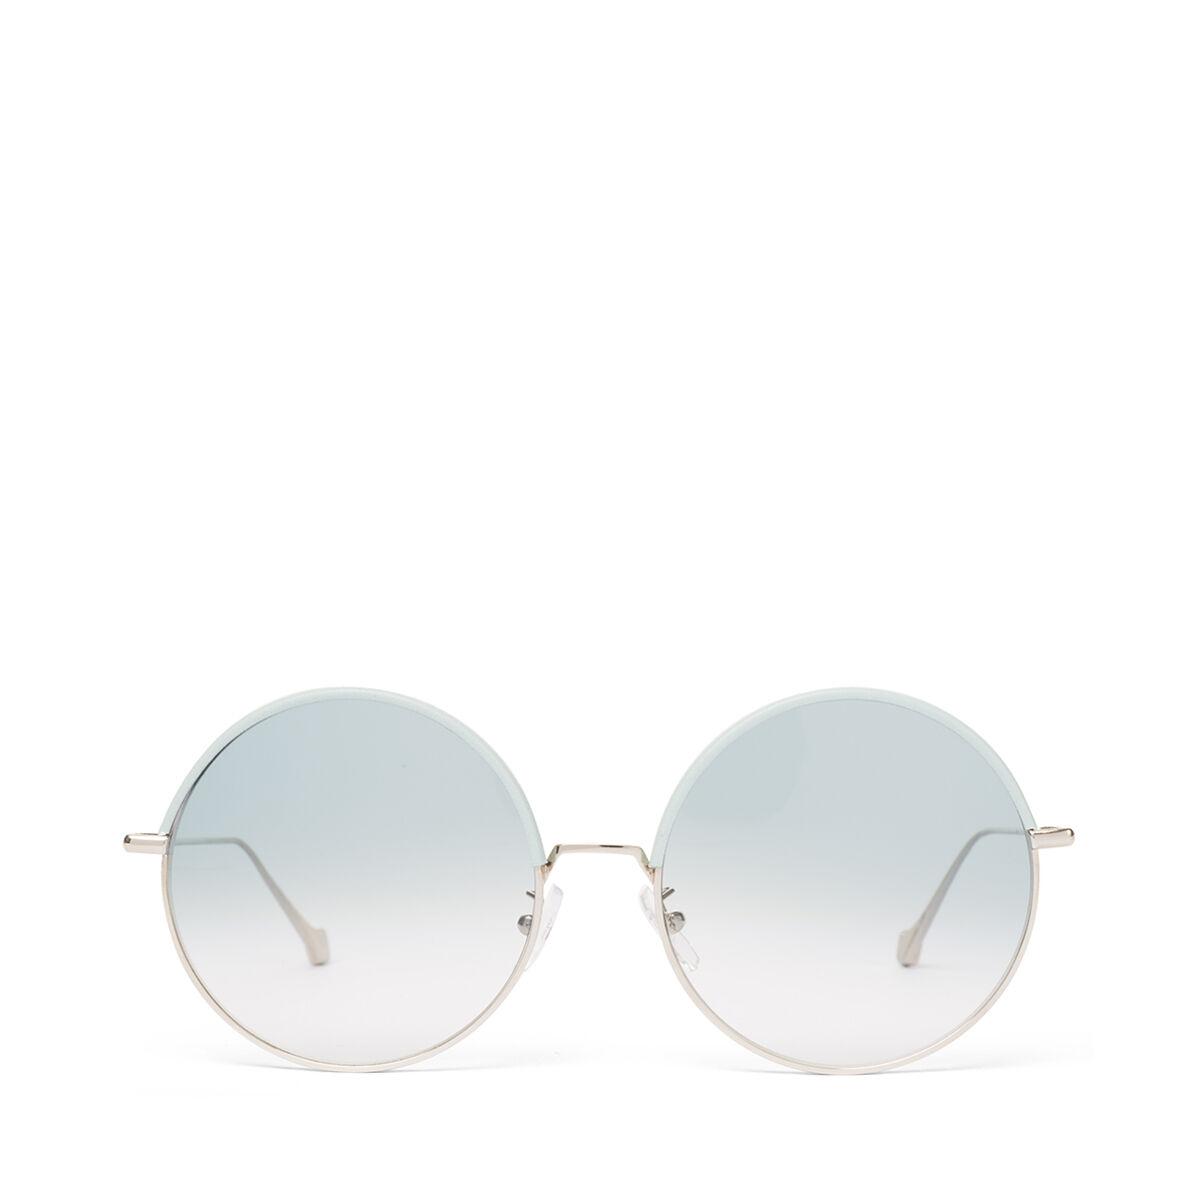 LOEWE Round Sunglasses Sky Blue/Gradient Turquoise all